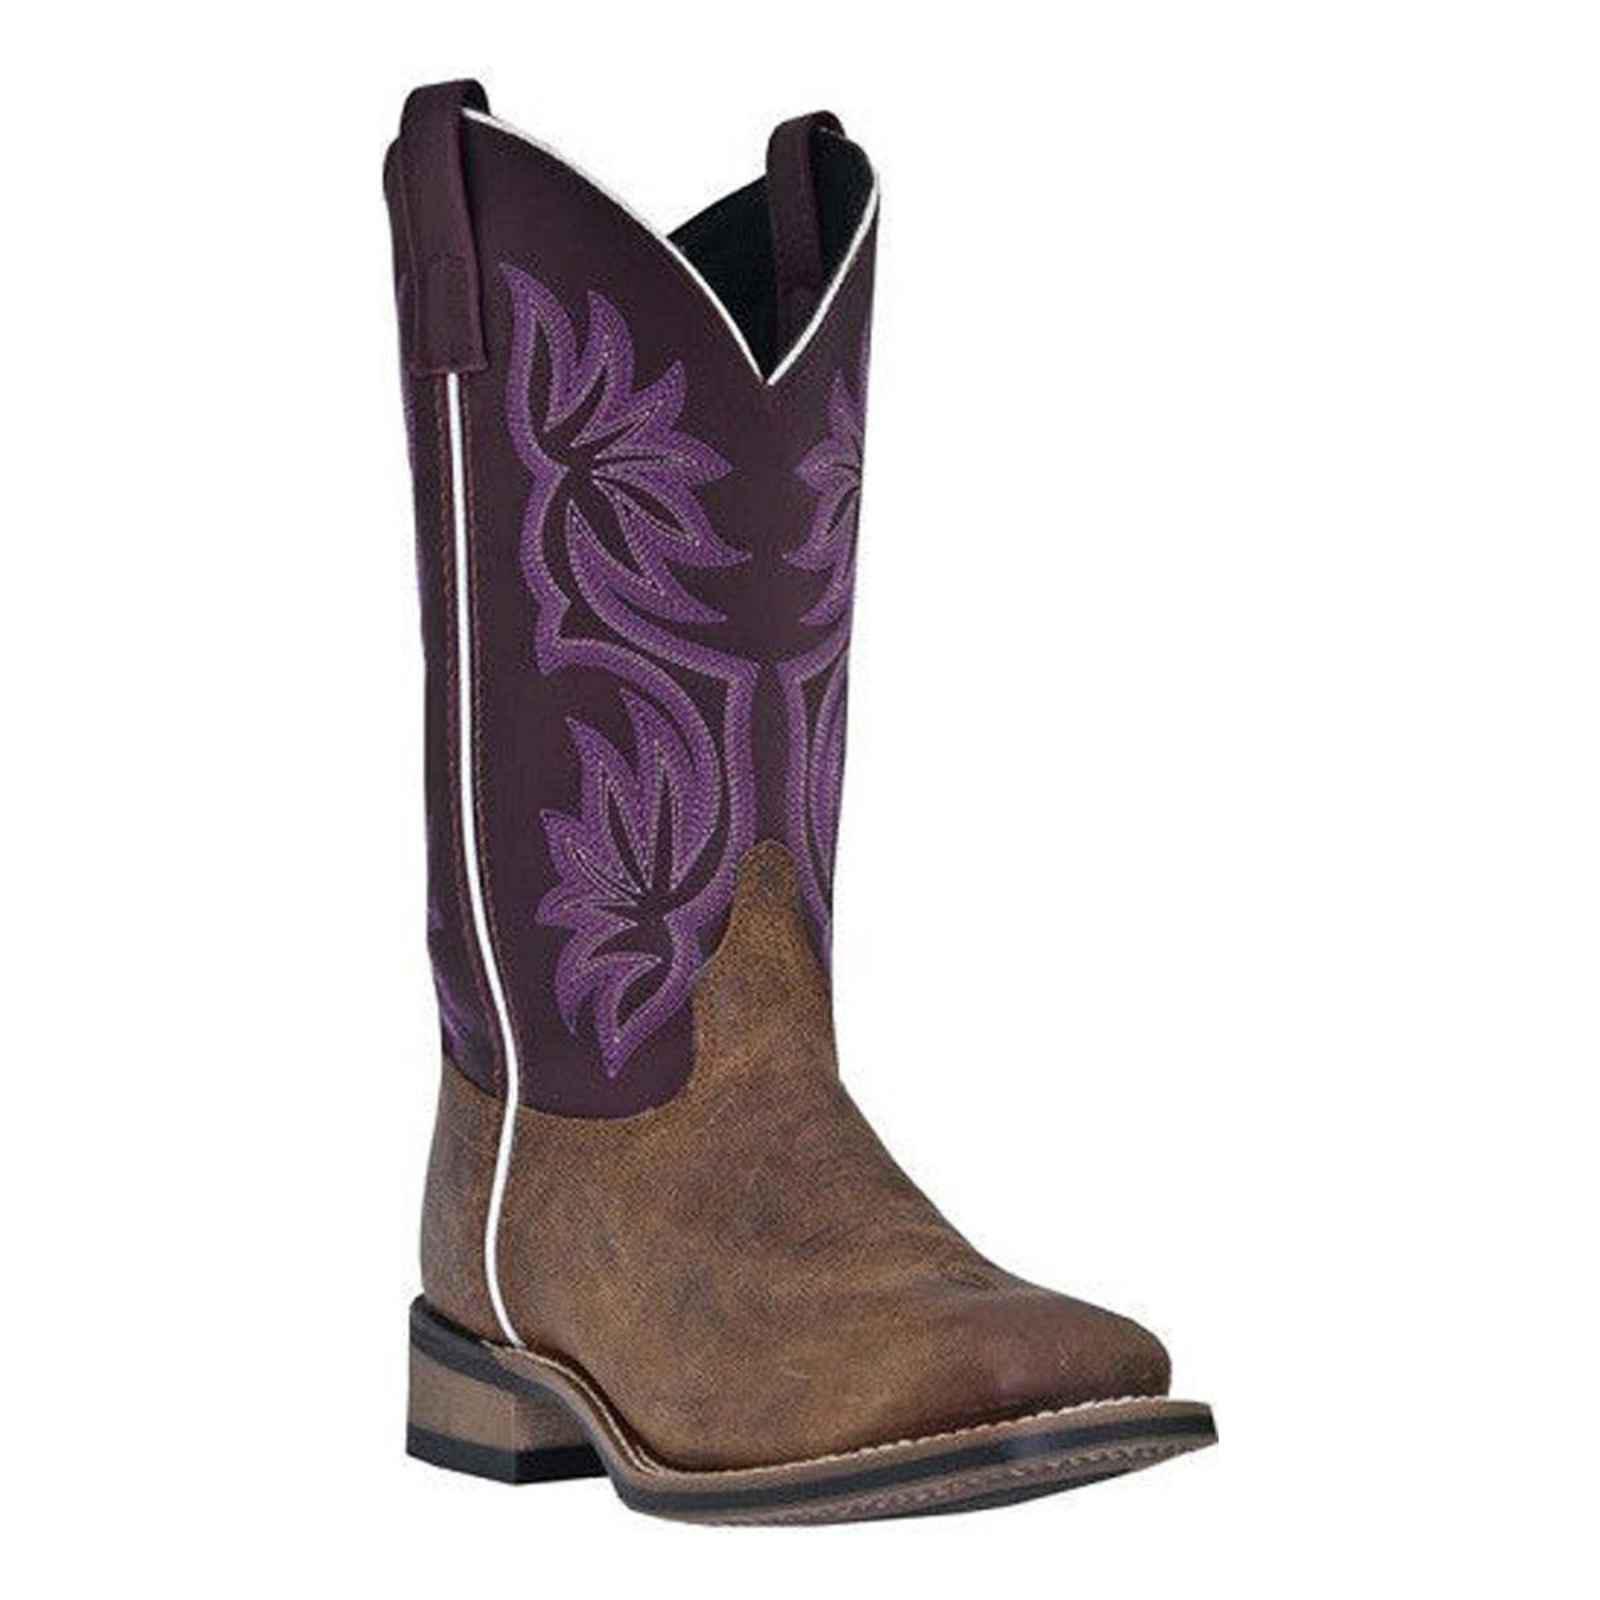 Laredo Western Boots Womens Cowboy Mesquite Vintage Tan Purple 5624 by Laredo